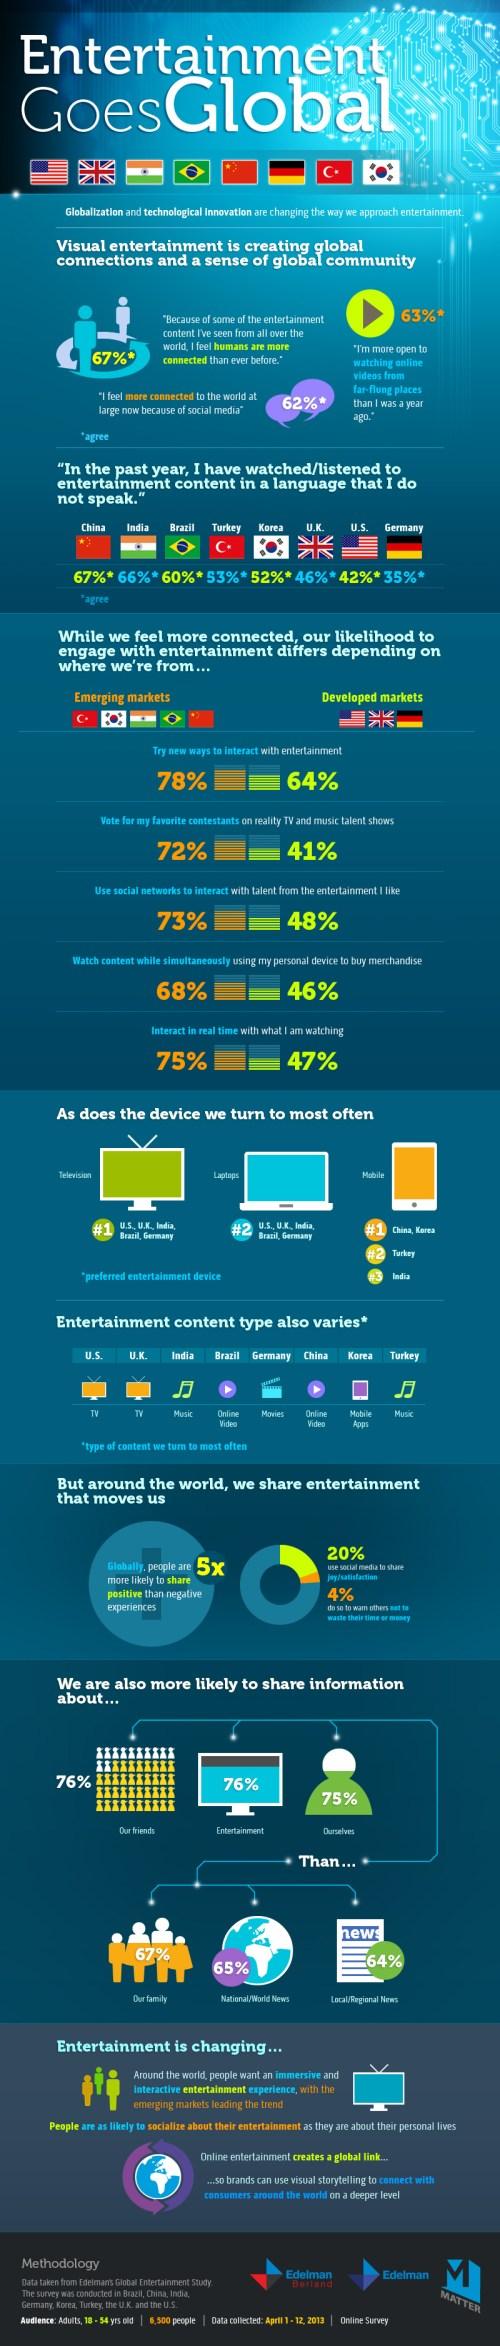 2013-edelman-global-entertainment-survey-entertainment-goes-global_51a58931838bd